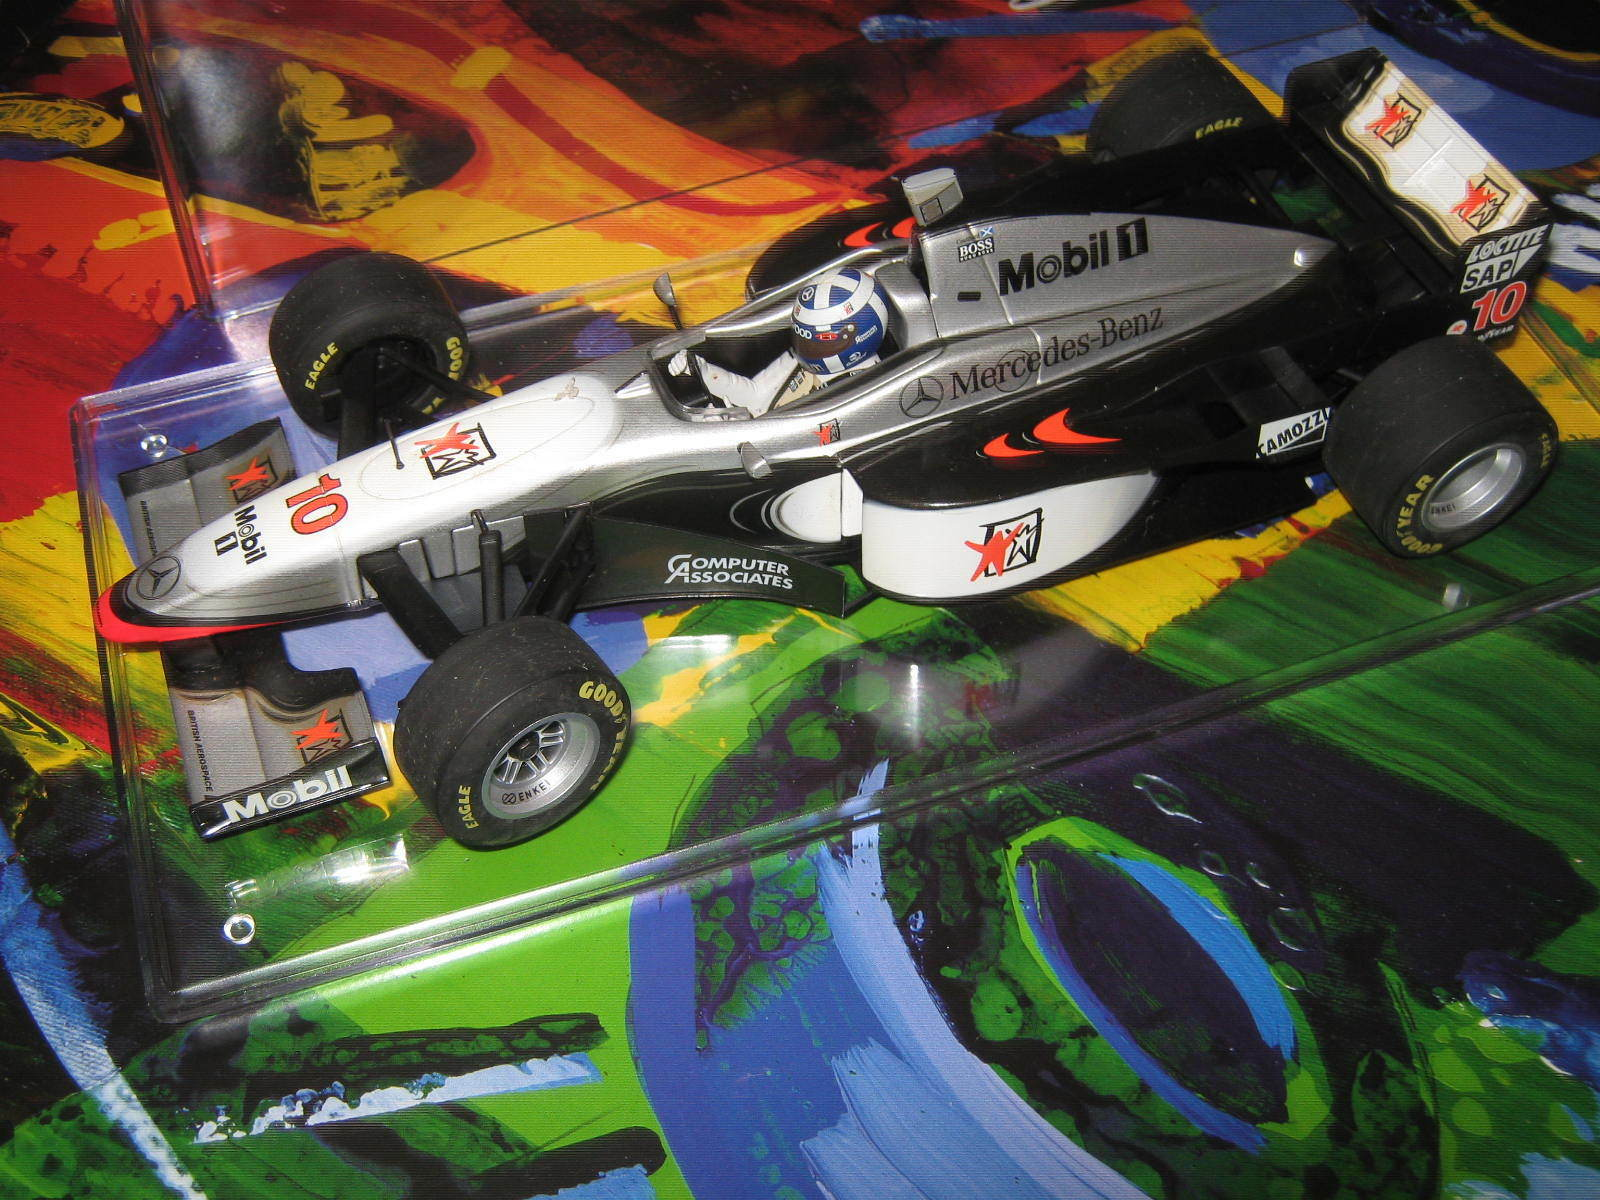 1 18 McLaren Mercedes MP4 12 D. Coulthard 1997 in in in brandnew showcase TOP 6b18ea